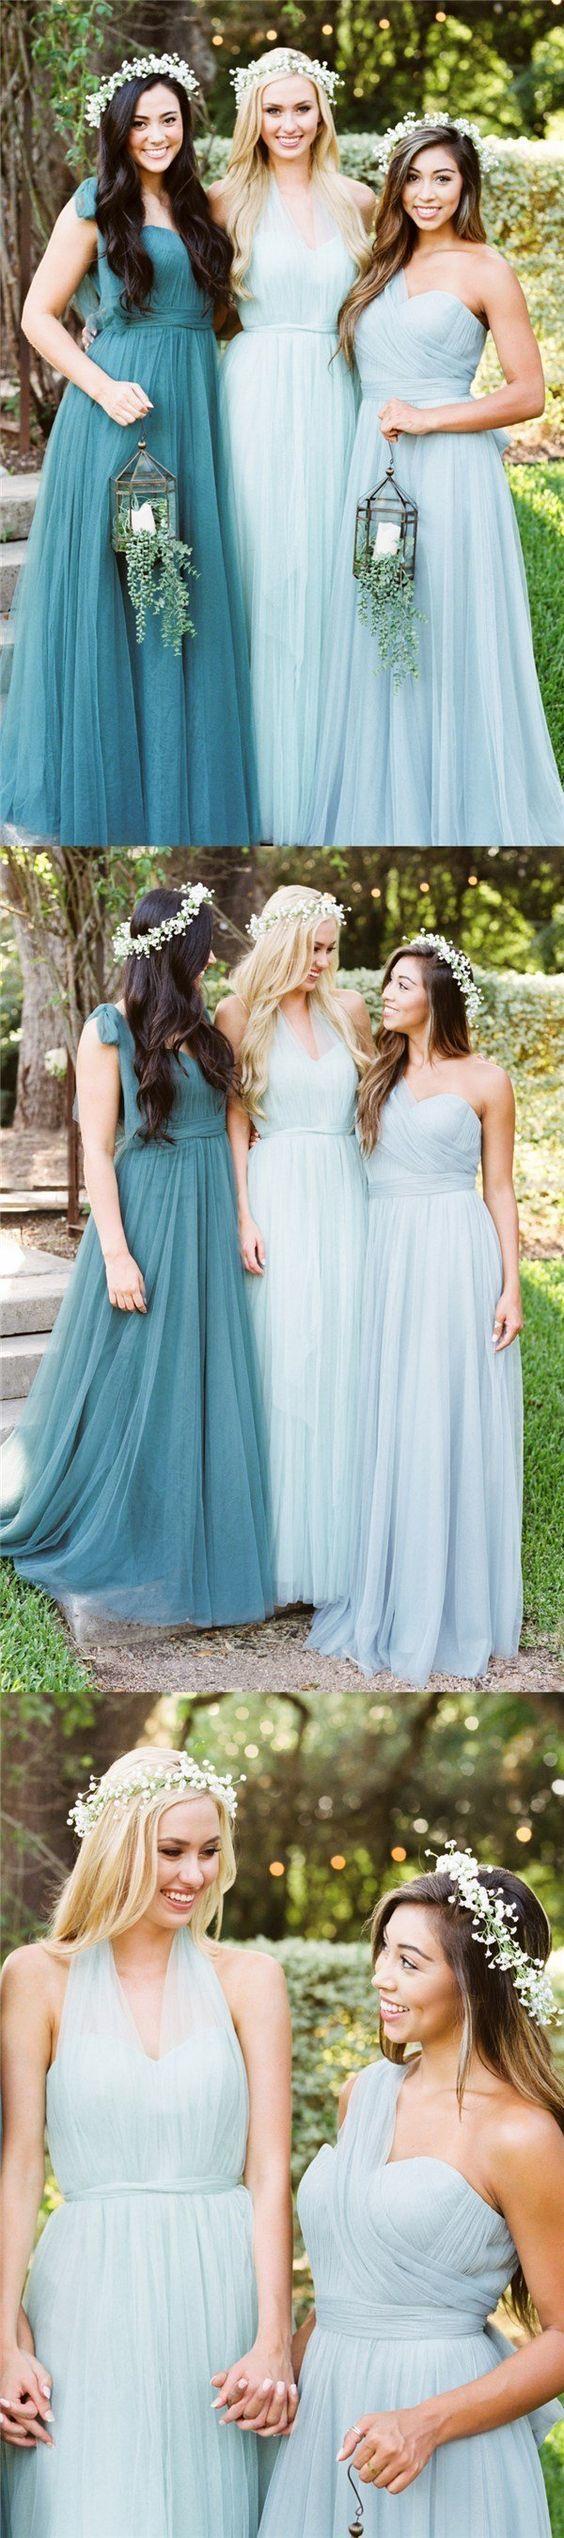 New Arrival Formal Elegant Long Bridesmaid Dresses, Custom Popular Bridesmaid